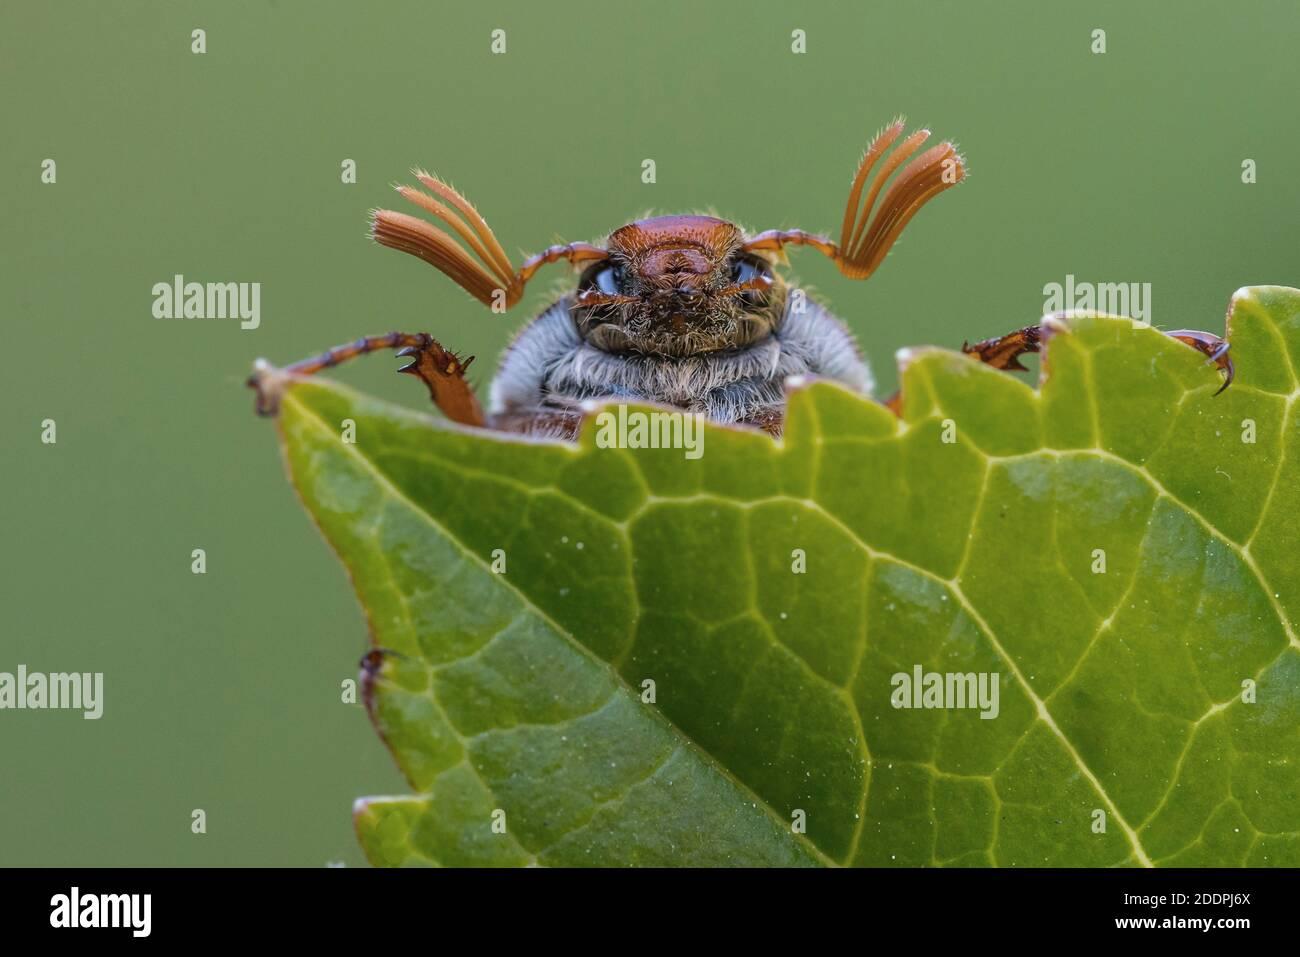 Common cockchafer, Maybug, Maybeetle (Melolontha melolontha), portrait on a leaf, Germany, Lower Saxony Stock Photo